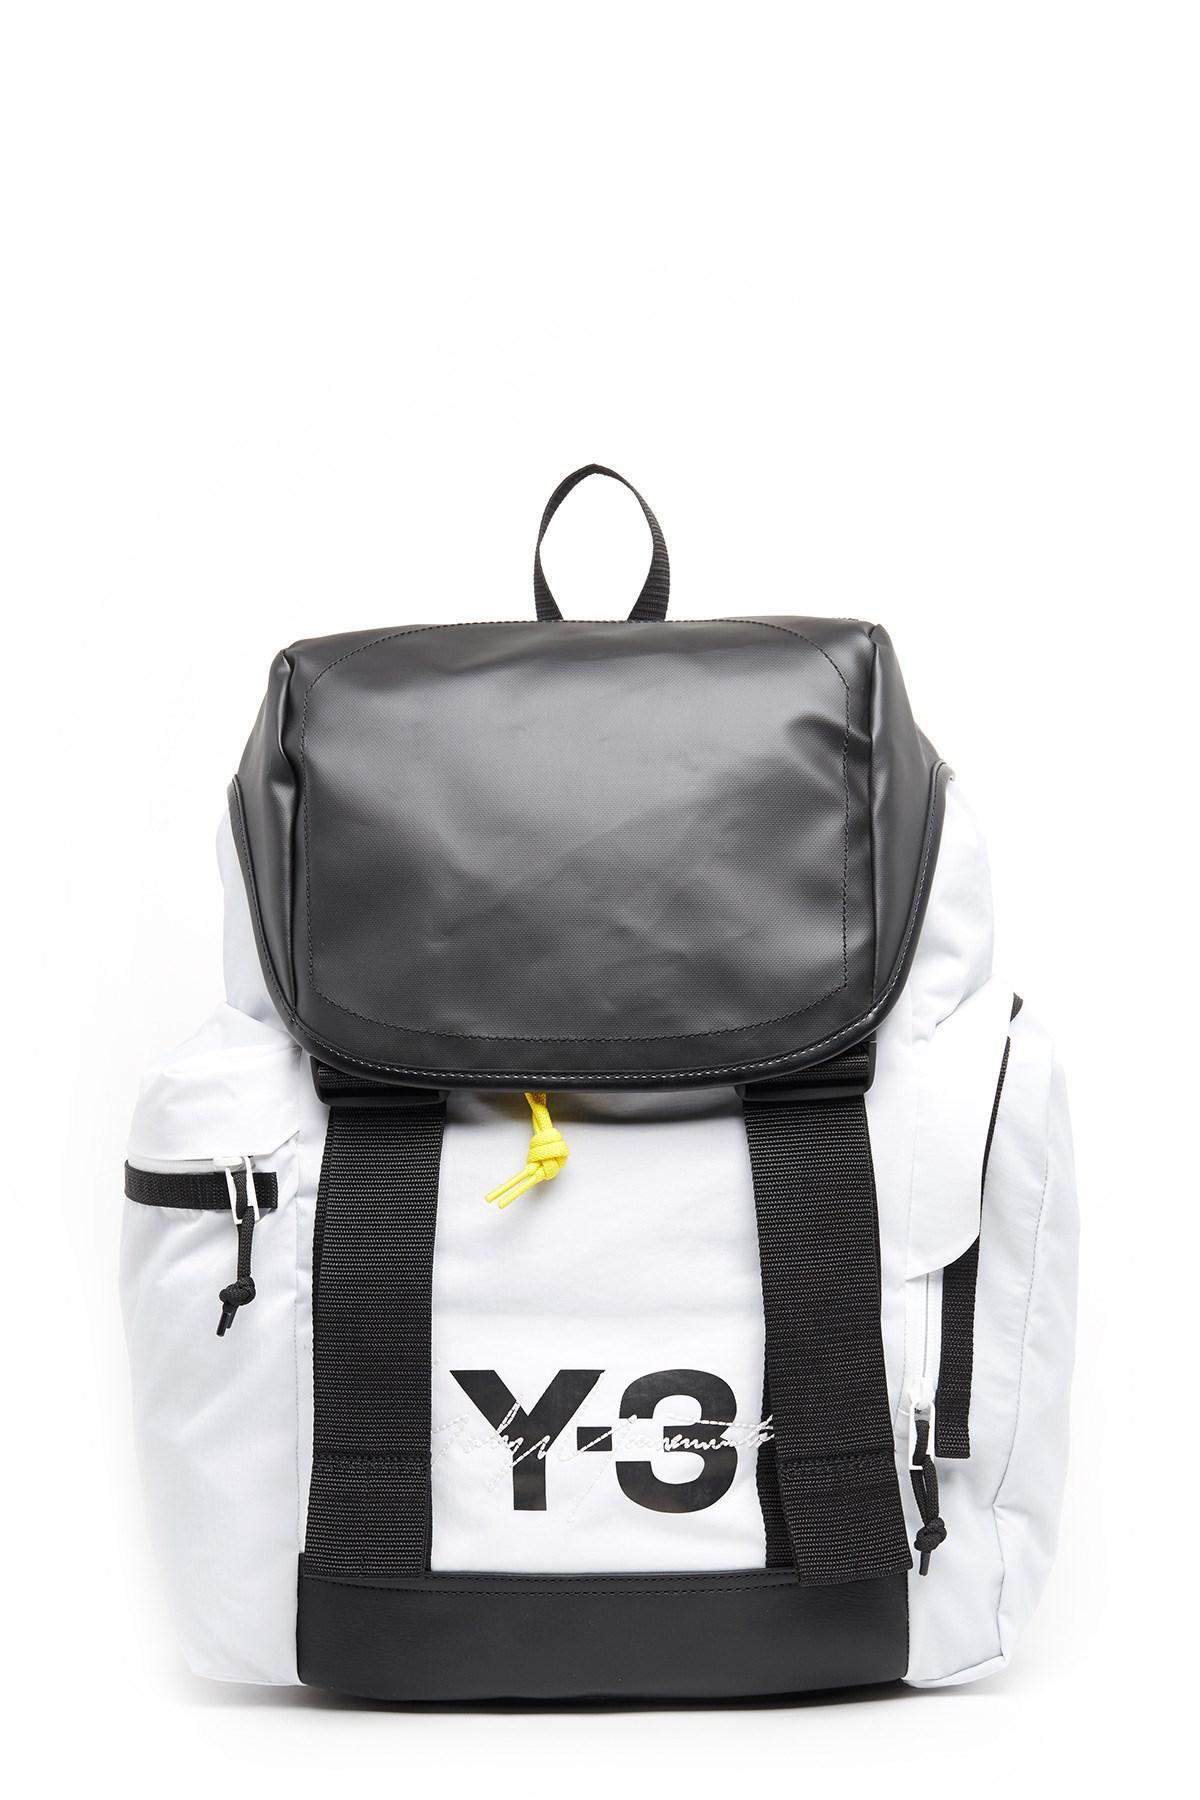 Lyst - Y-3 Mobility Color-block Backpack in Black for Men 0c30713124b52